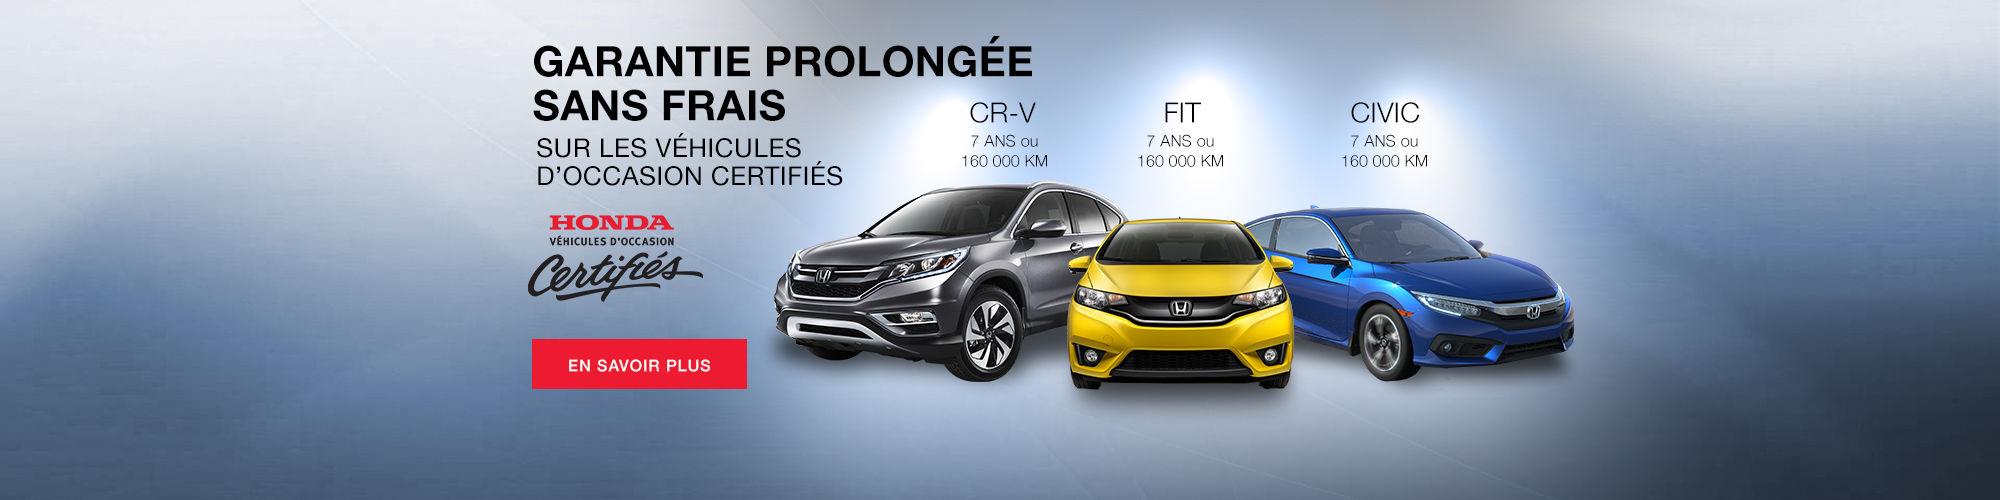 Honda - garantie prolongée